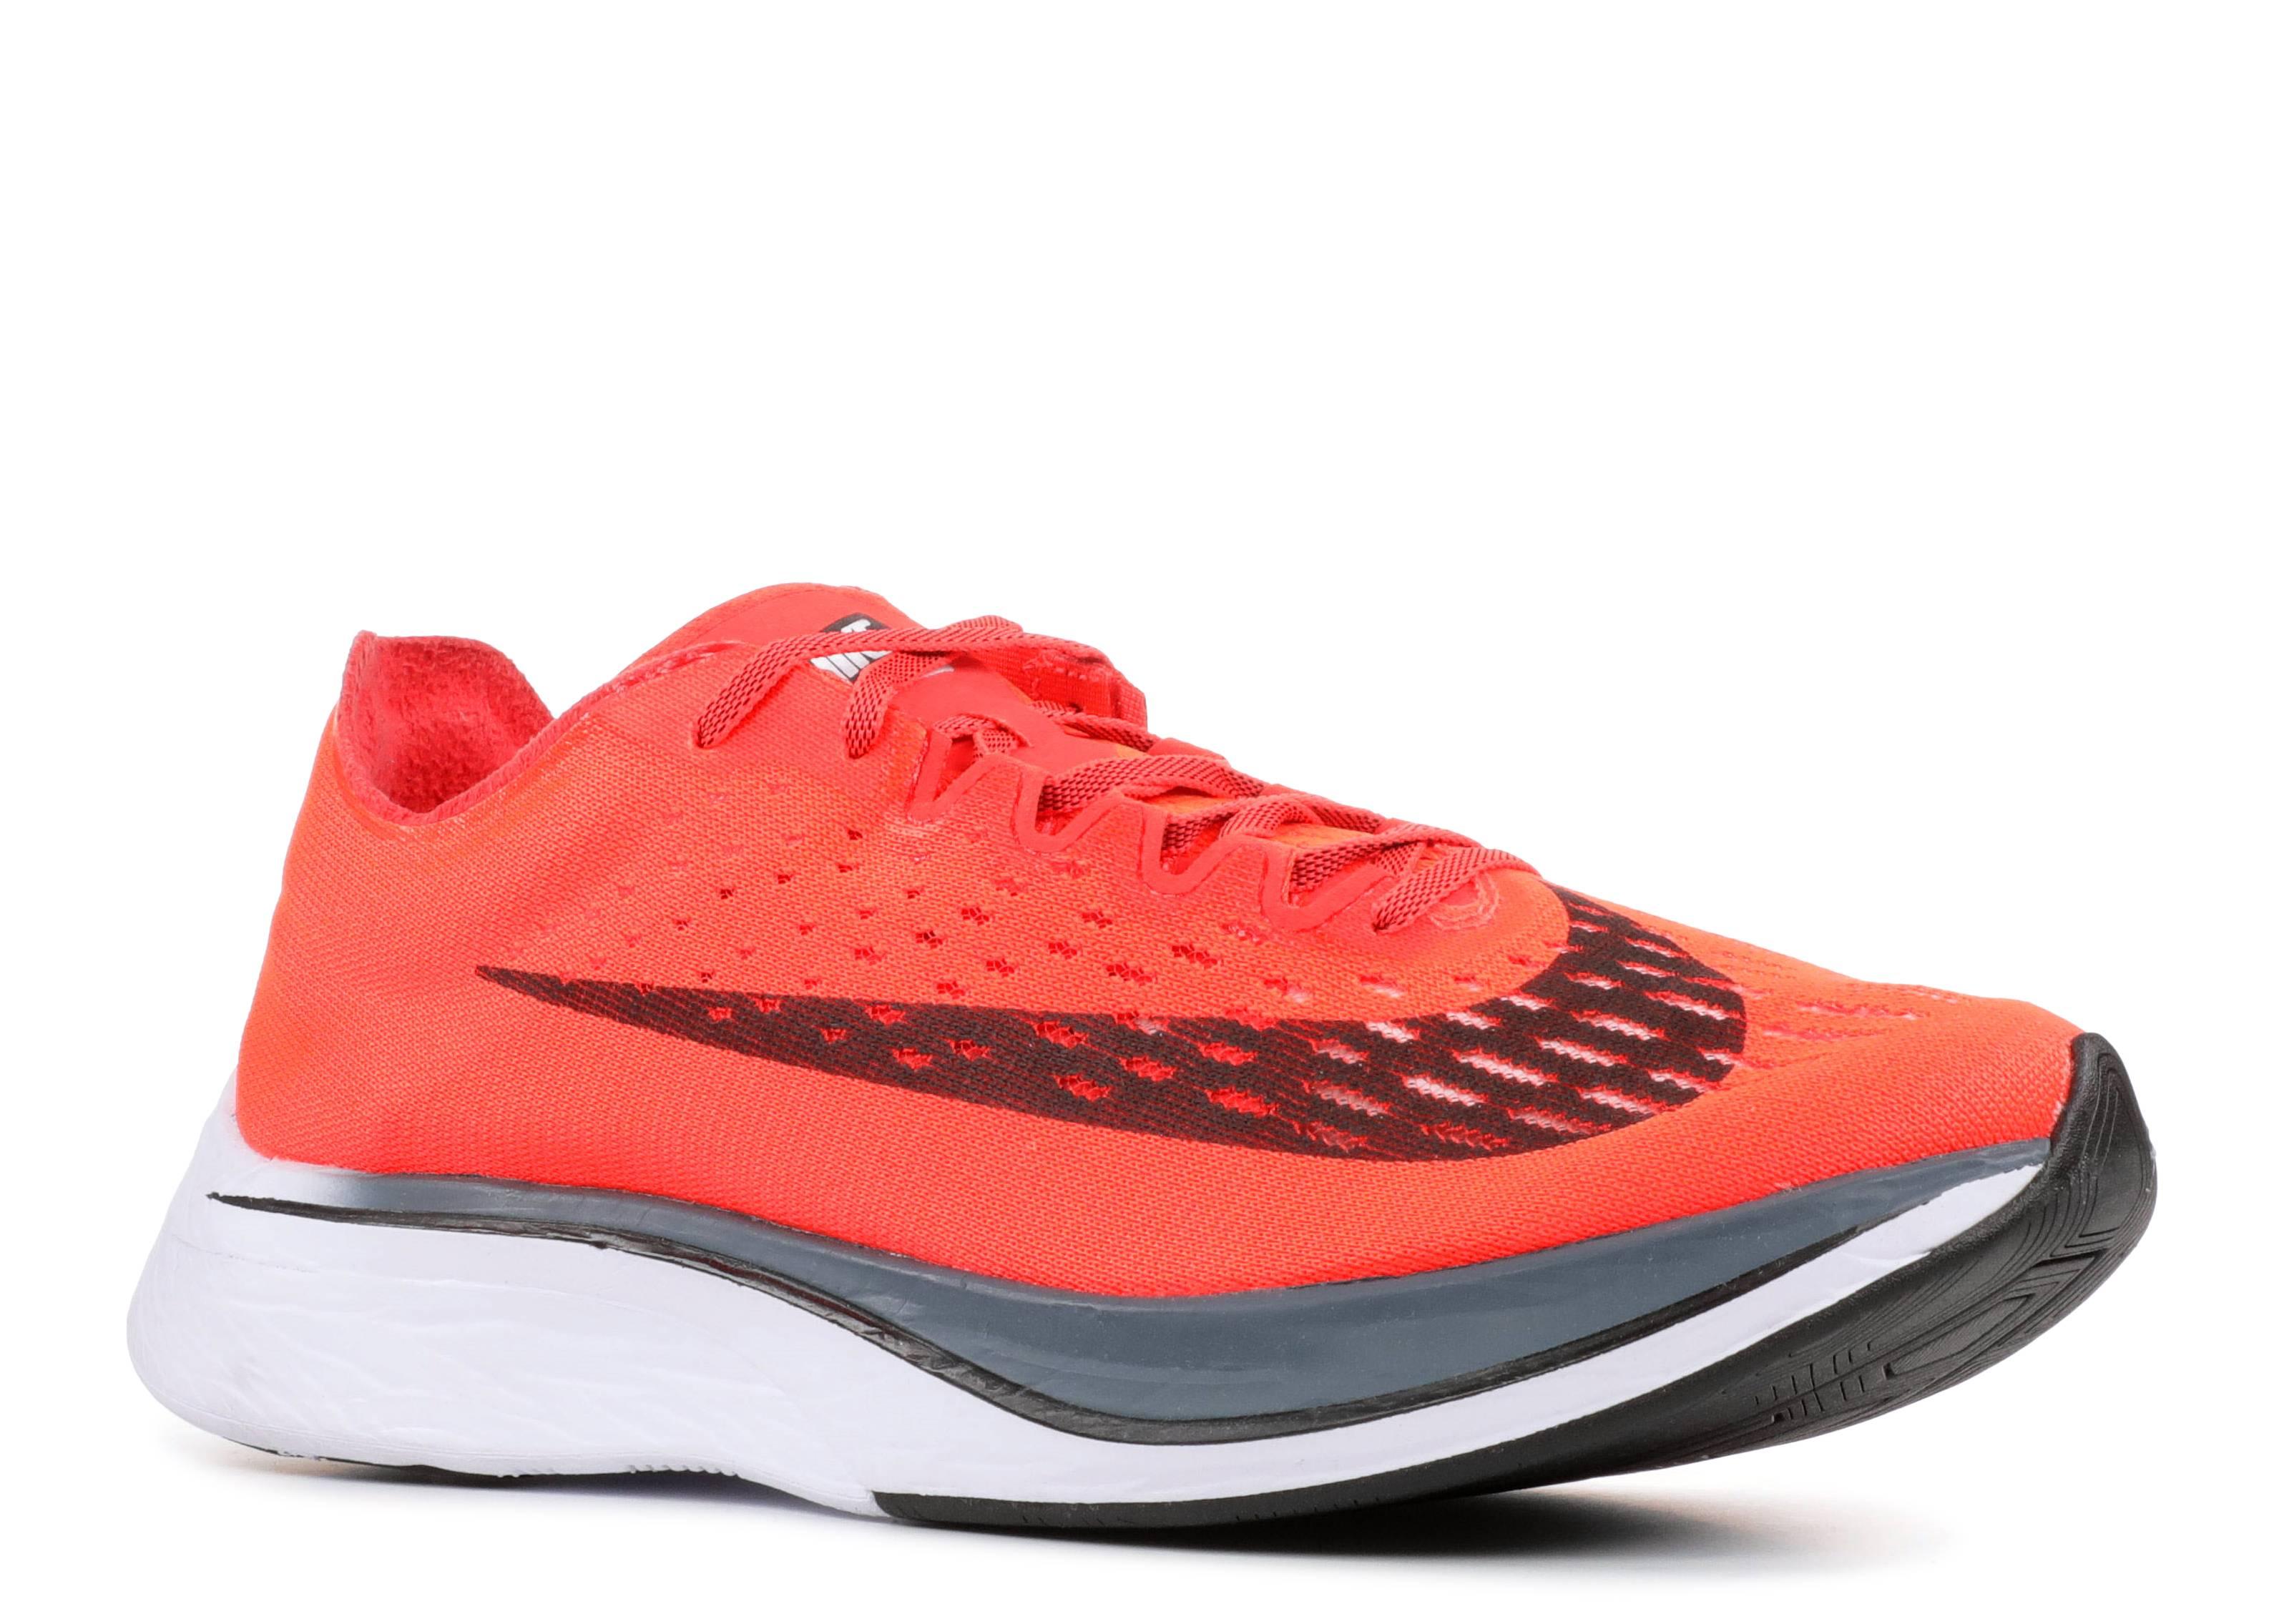 304bf2b2fd020 Nike Zoom Vaporfly 4% - Nike - 880847 600 - bright crimson  black ...